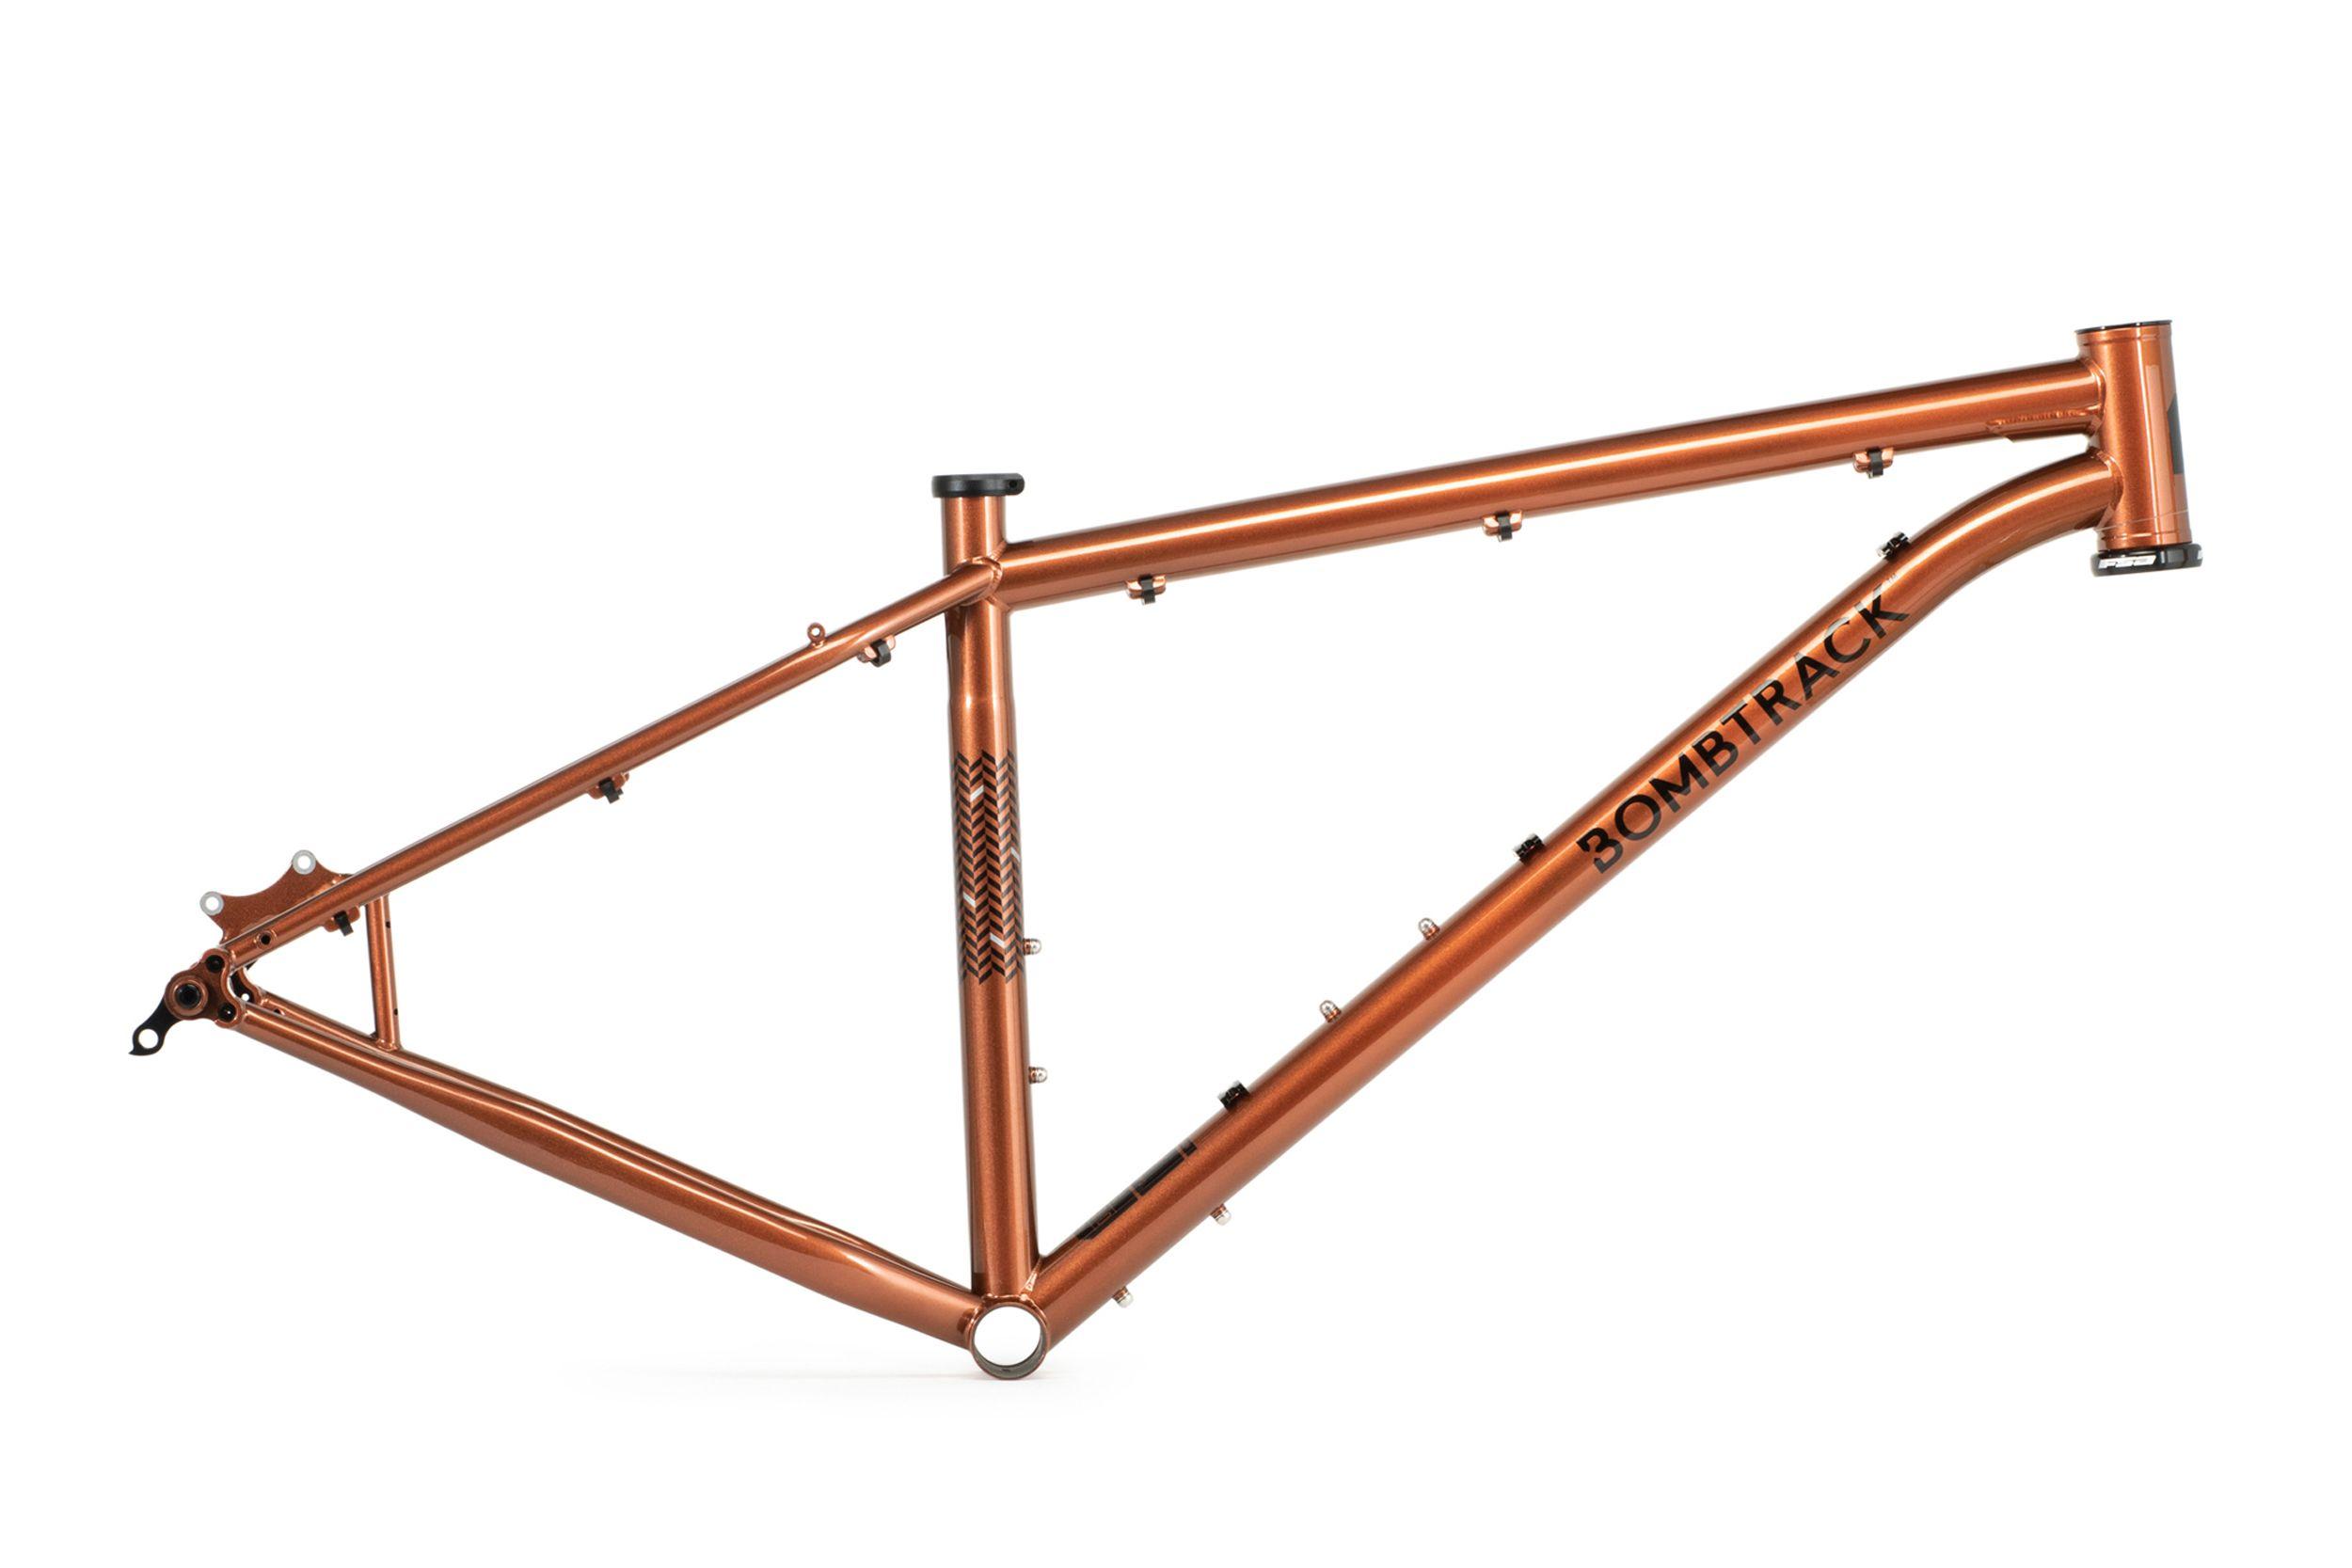 Cyclestore.co.uk | Frames